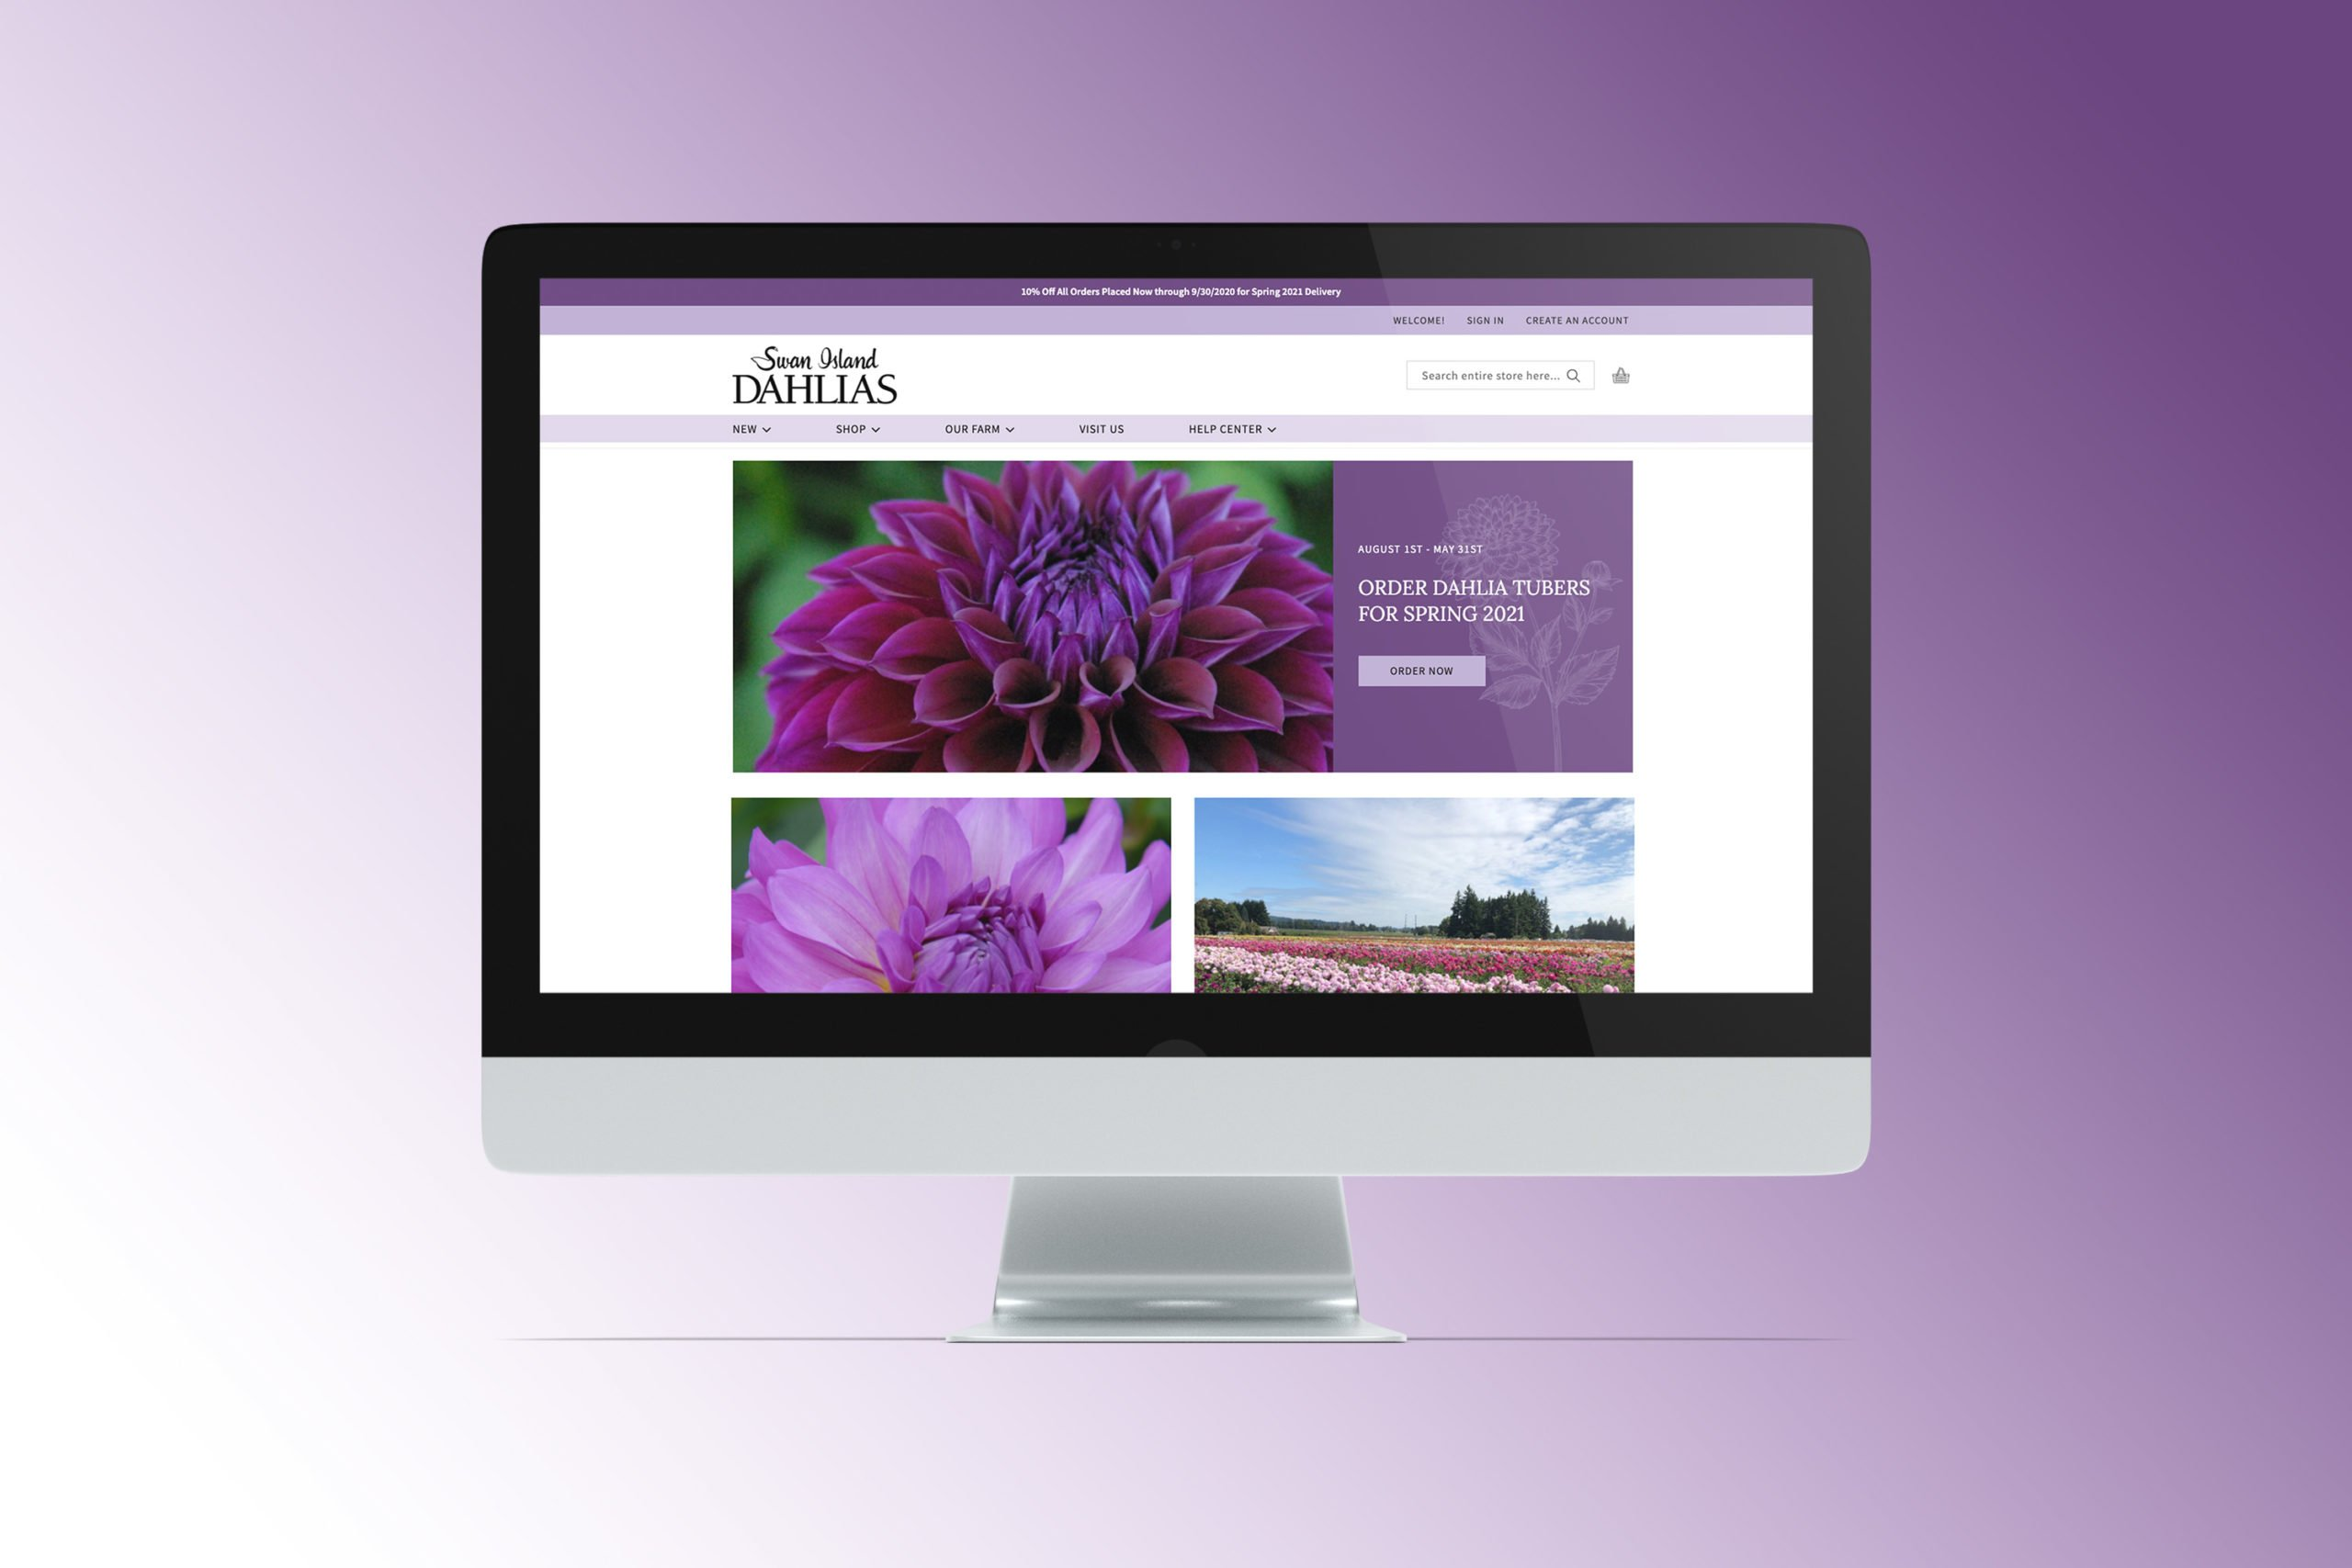 Swan Island Dahlias homepage after redesign on desktop